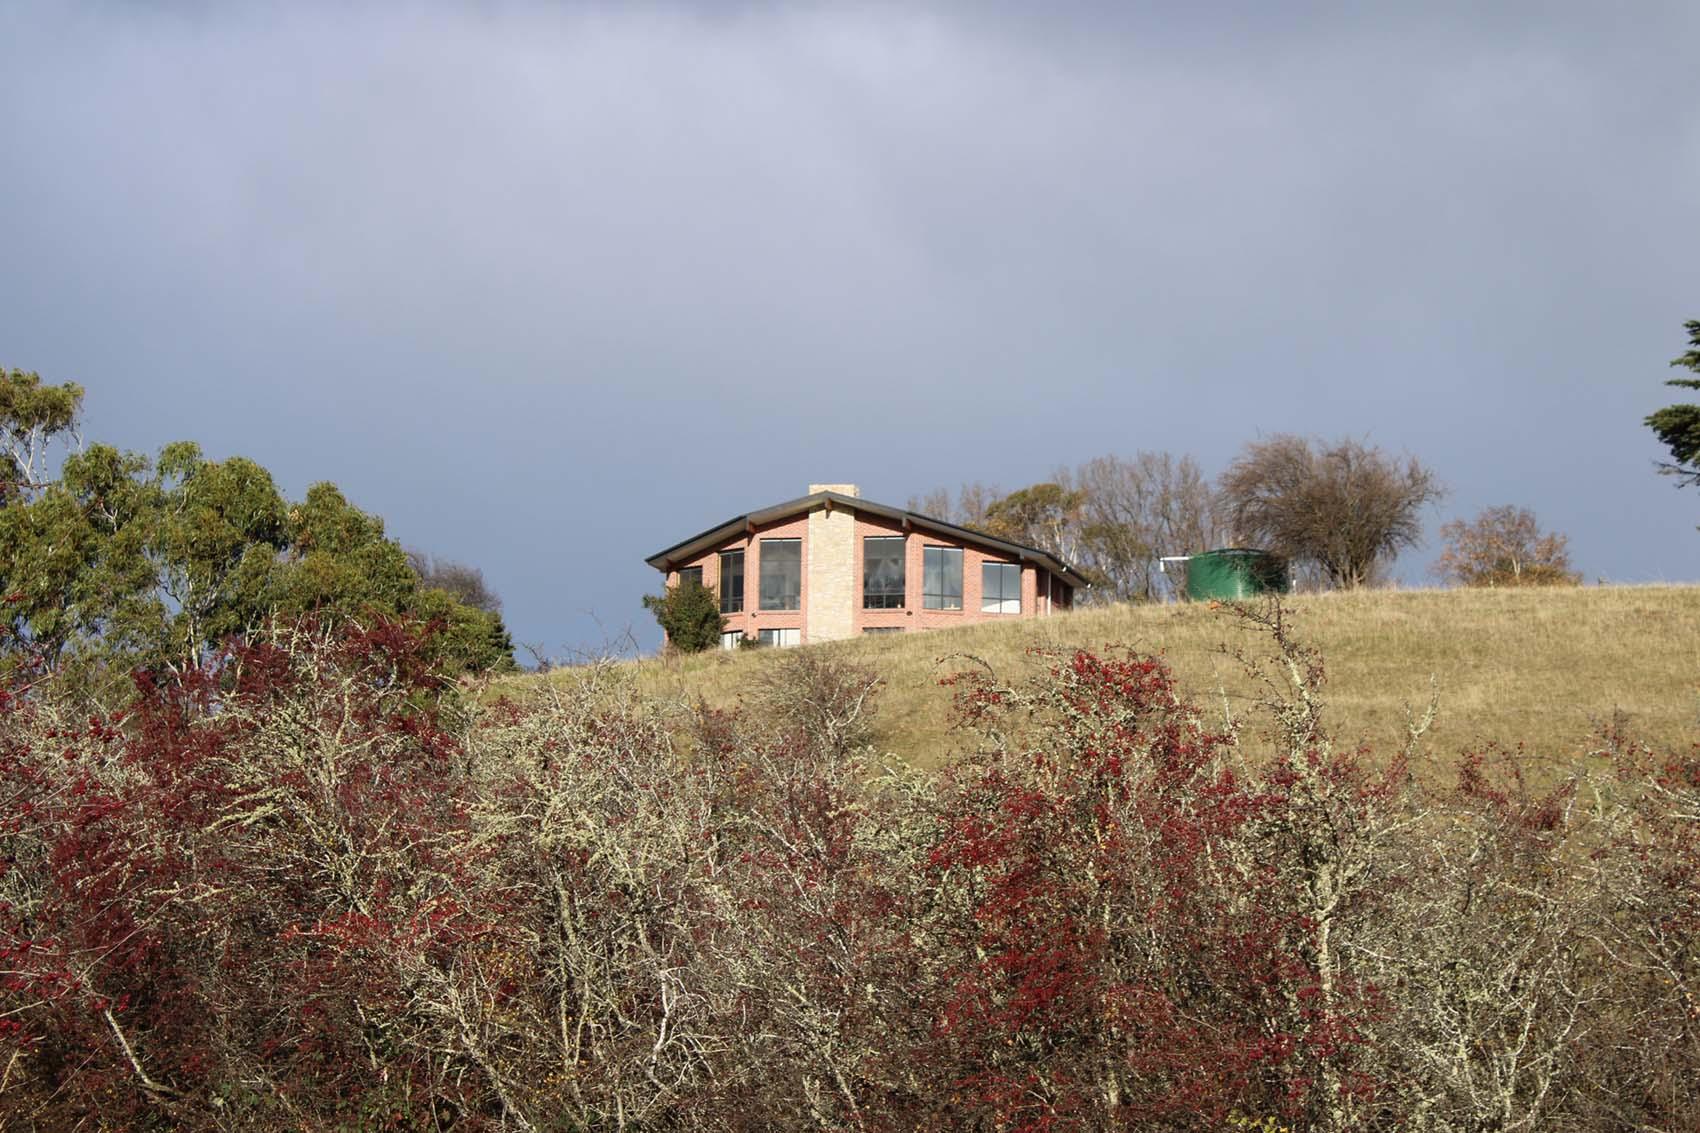 321-build-new-home-renovations-extension-hobart-tasmania-6